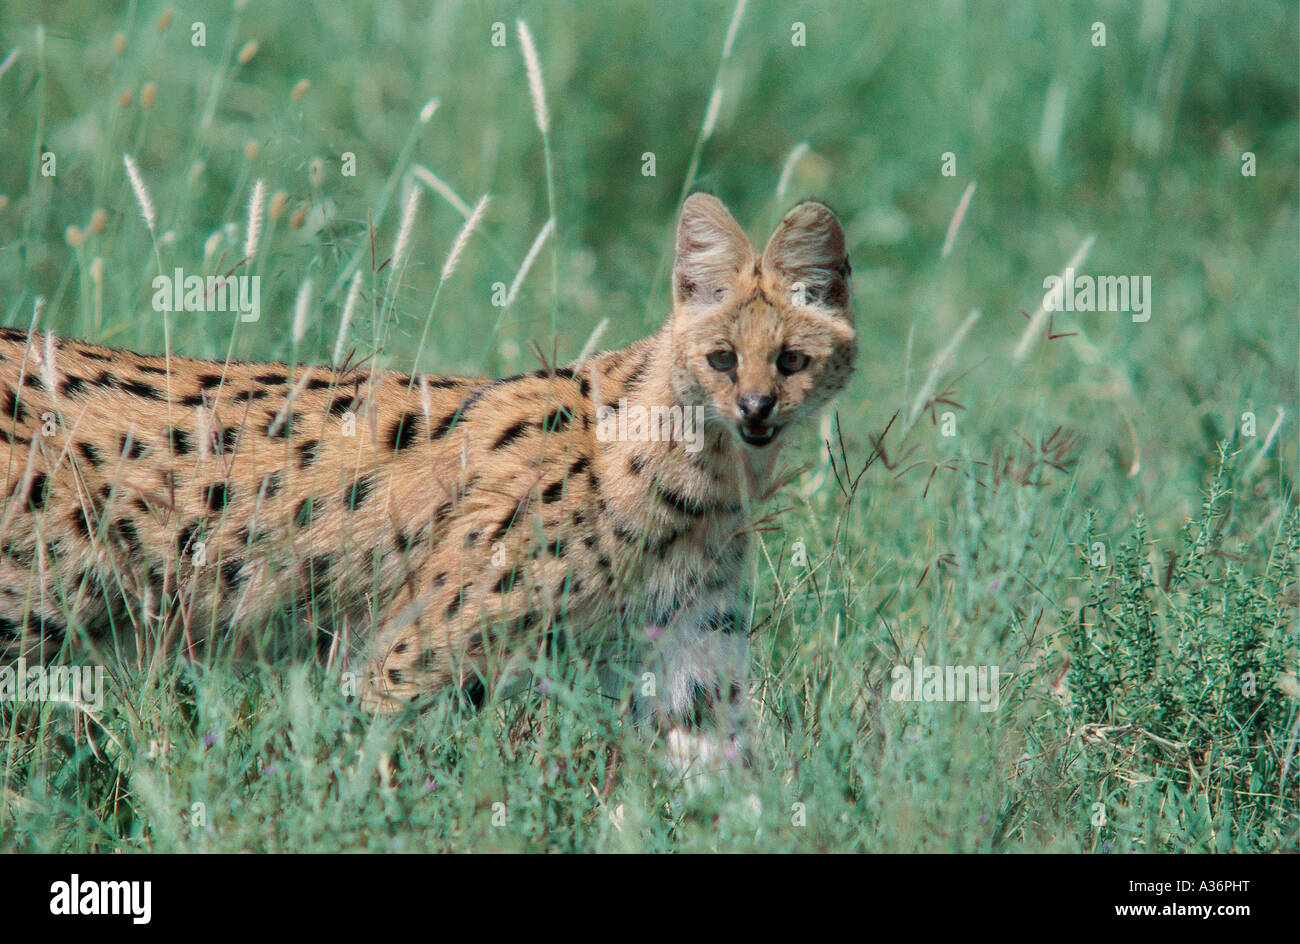 Serval cat standing alert in long grass in Serengeti National Park Tanzania - Stock Image